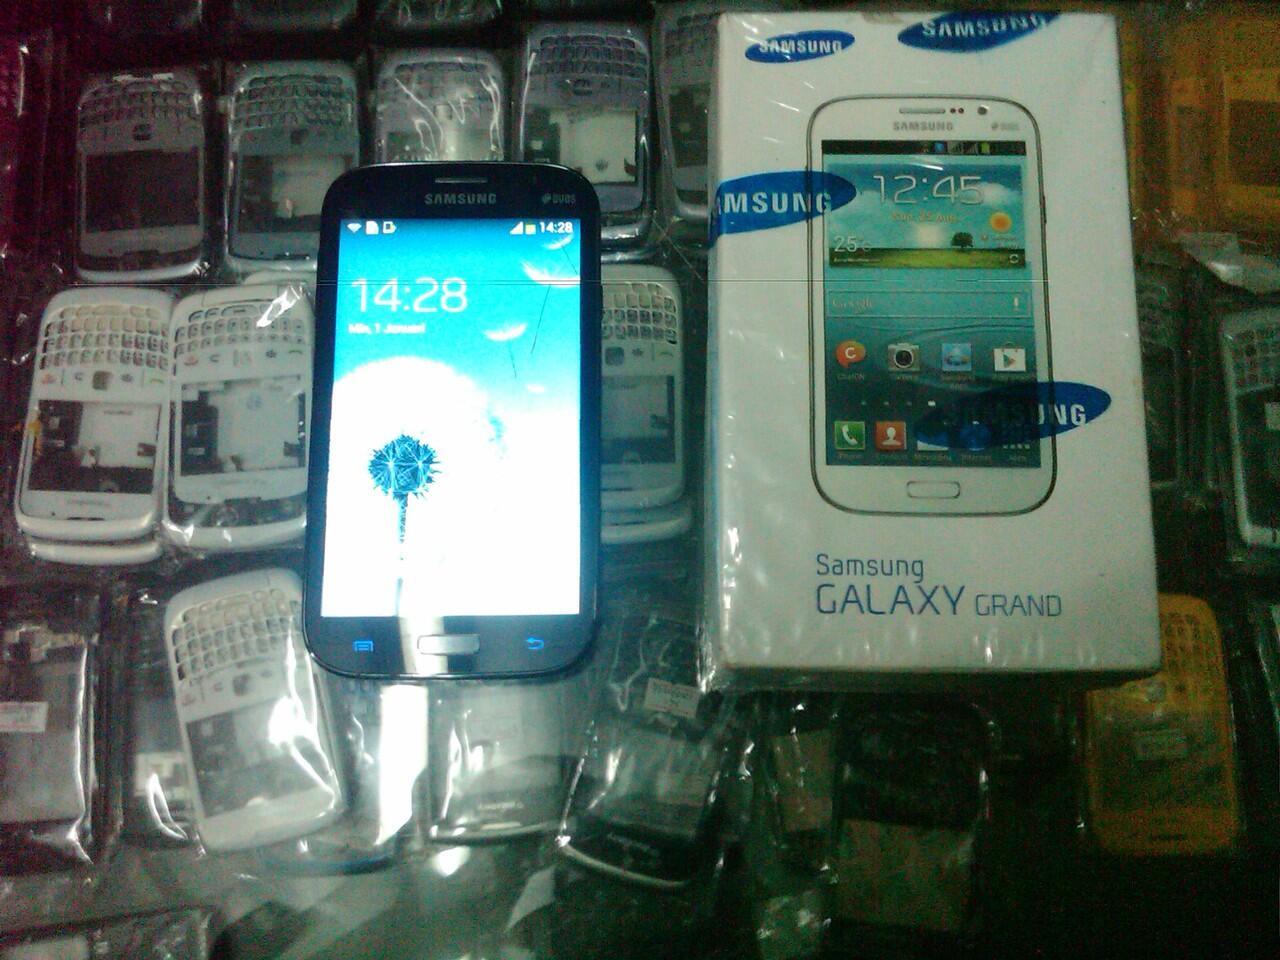 SAMSUNG GALAXY GRAND DU0S 1 Gt-i9082 Blue Malang